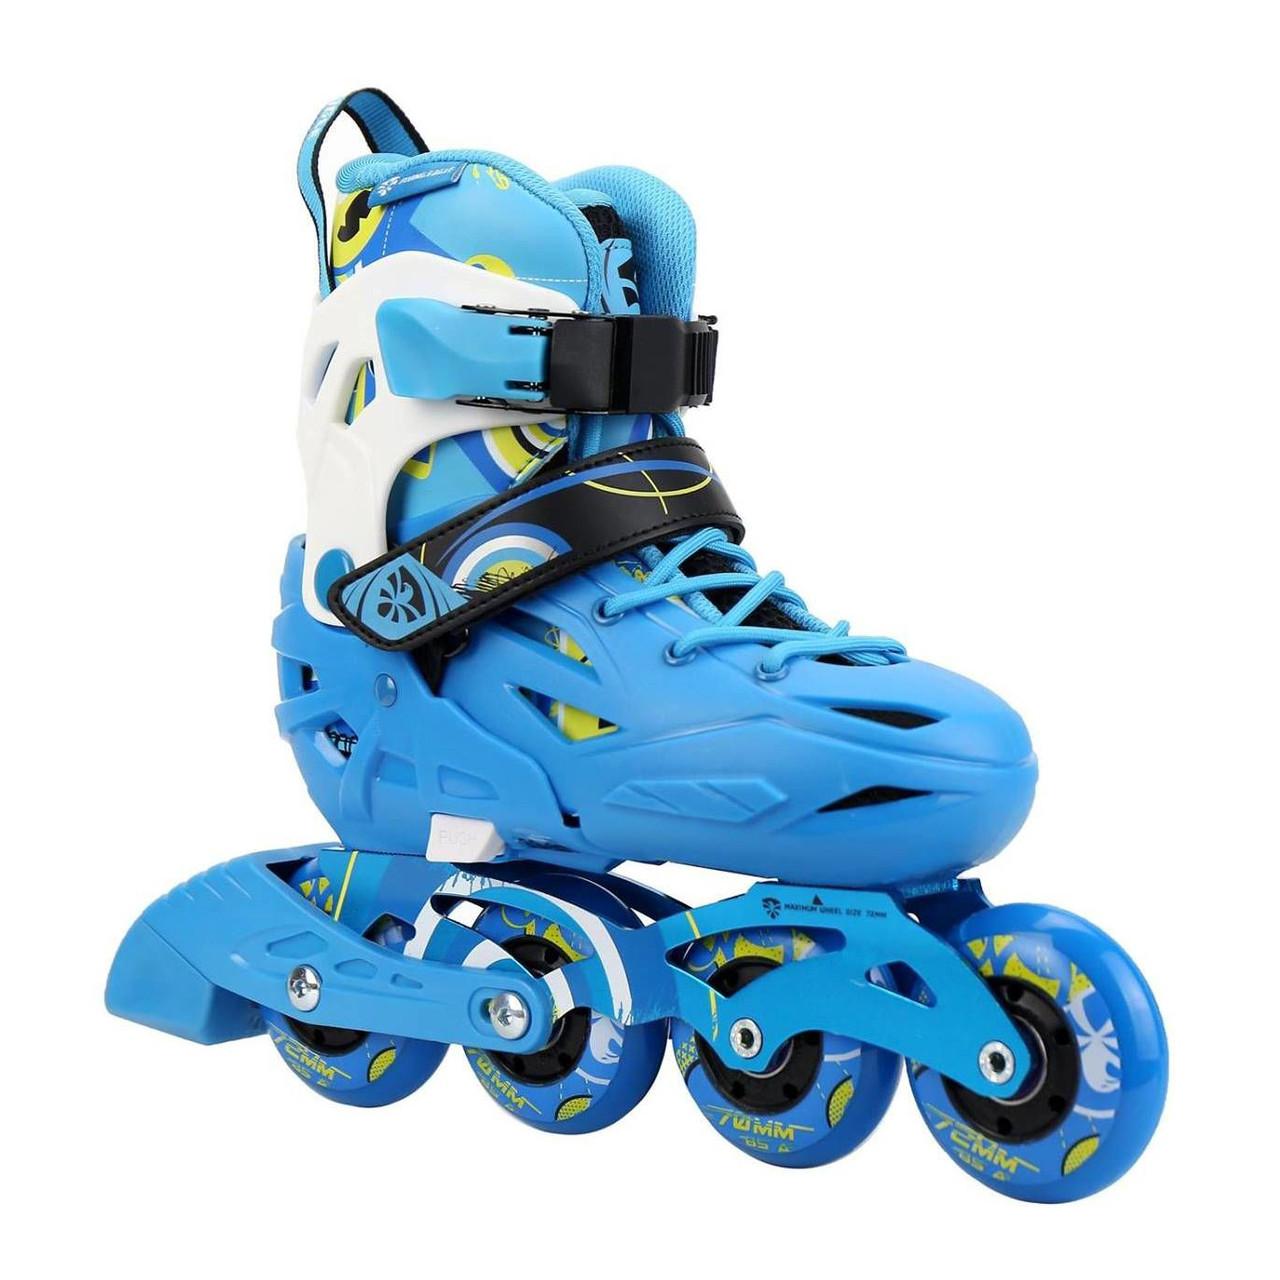 19eab374352487 Детские ролики Flying Eagle S5s Blue, цена 2 800 грн., купить в Киеве —  Prom.ua (ID#918170981)